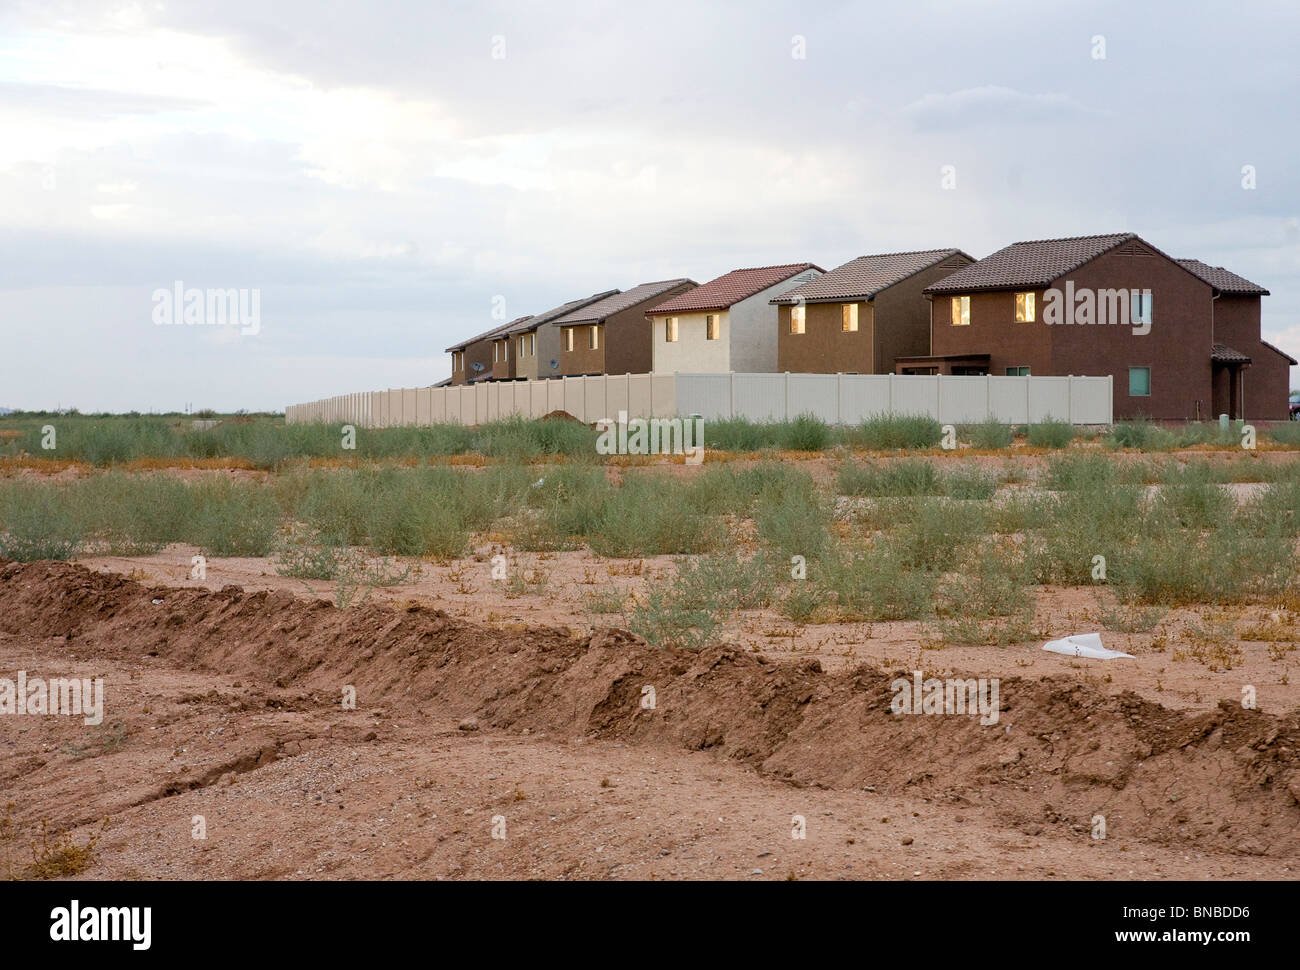 Unfinished and abandoned housing developments in the Phoenix, Arizona area.  - Stock Image